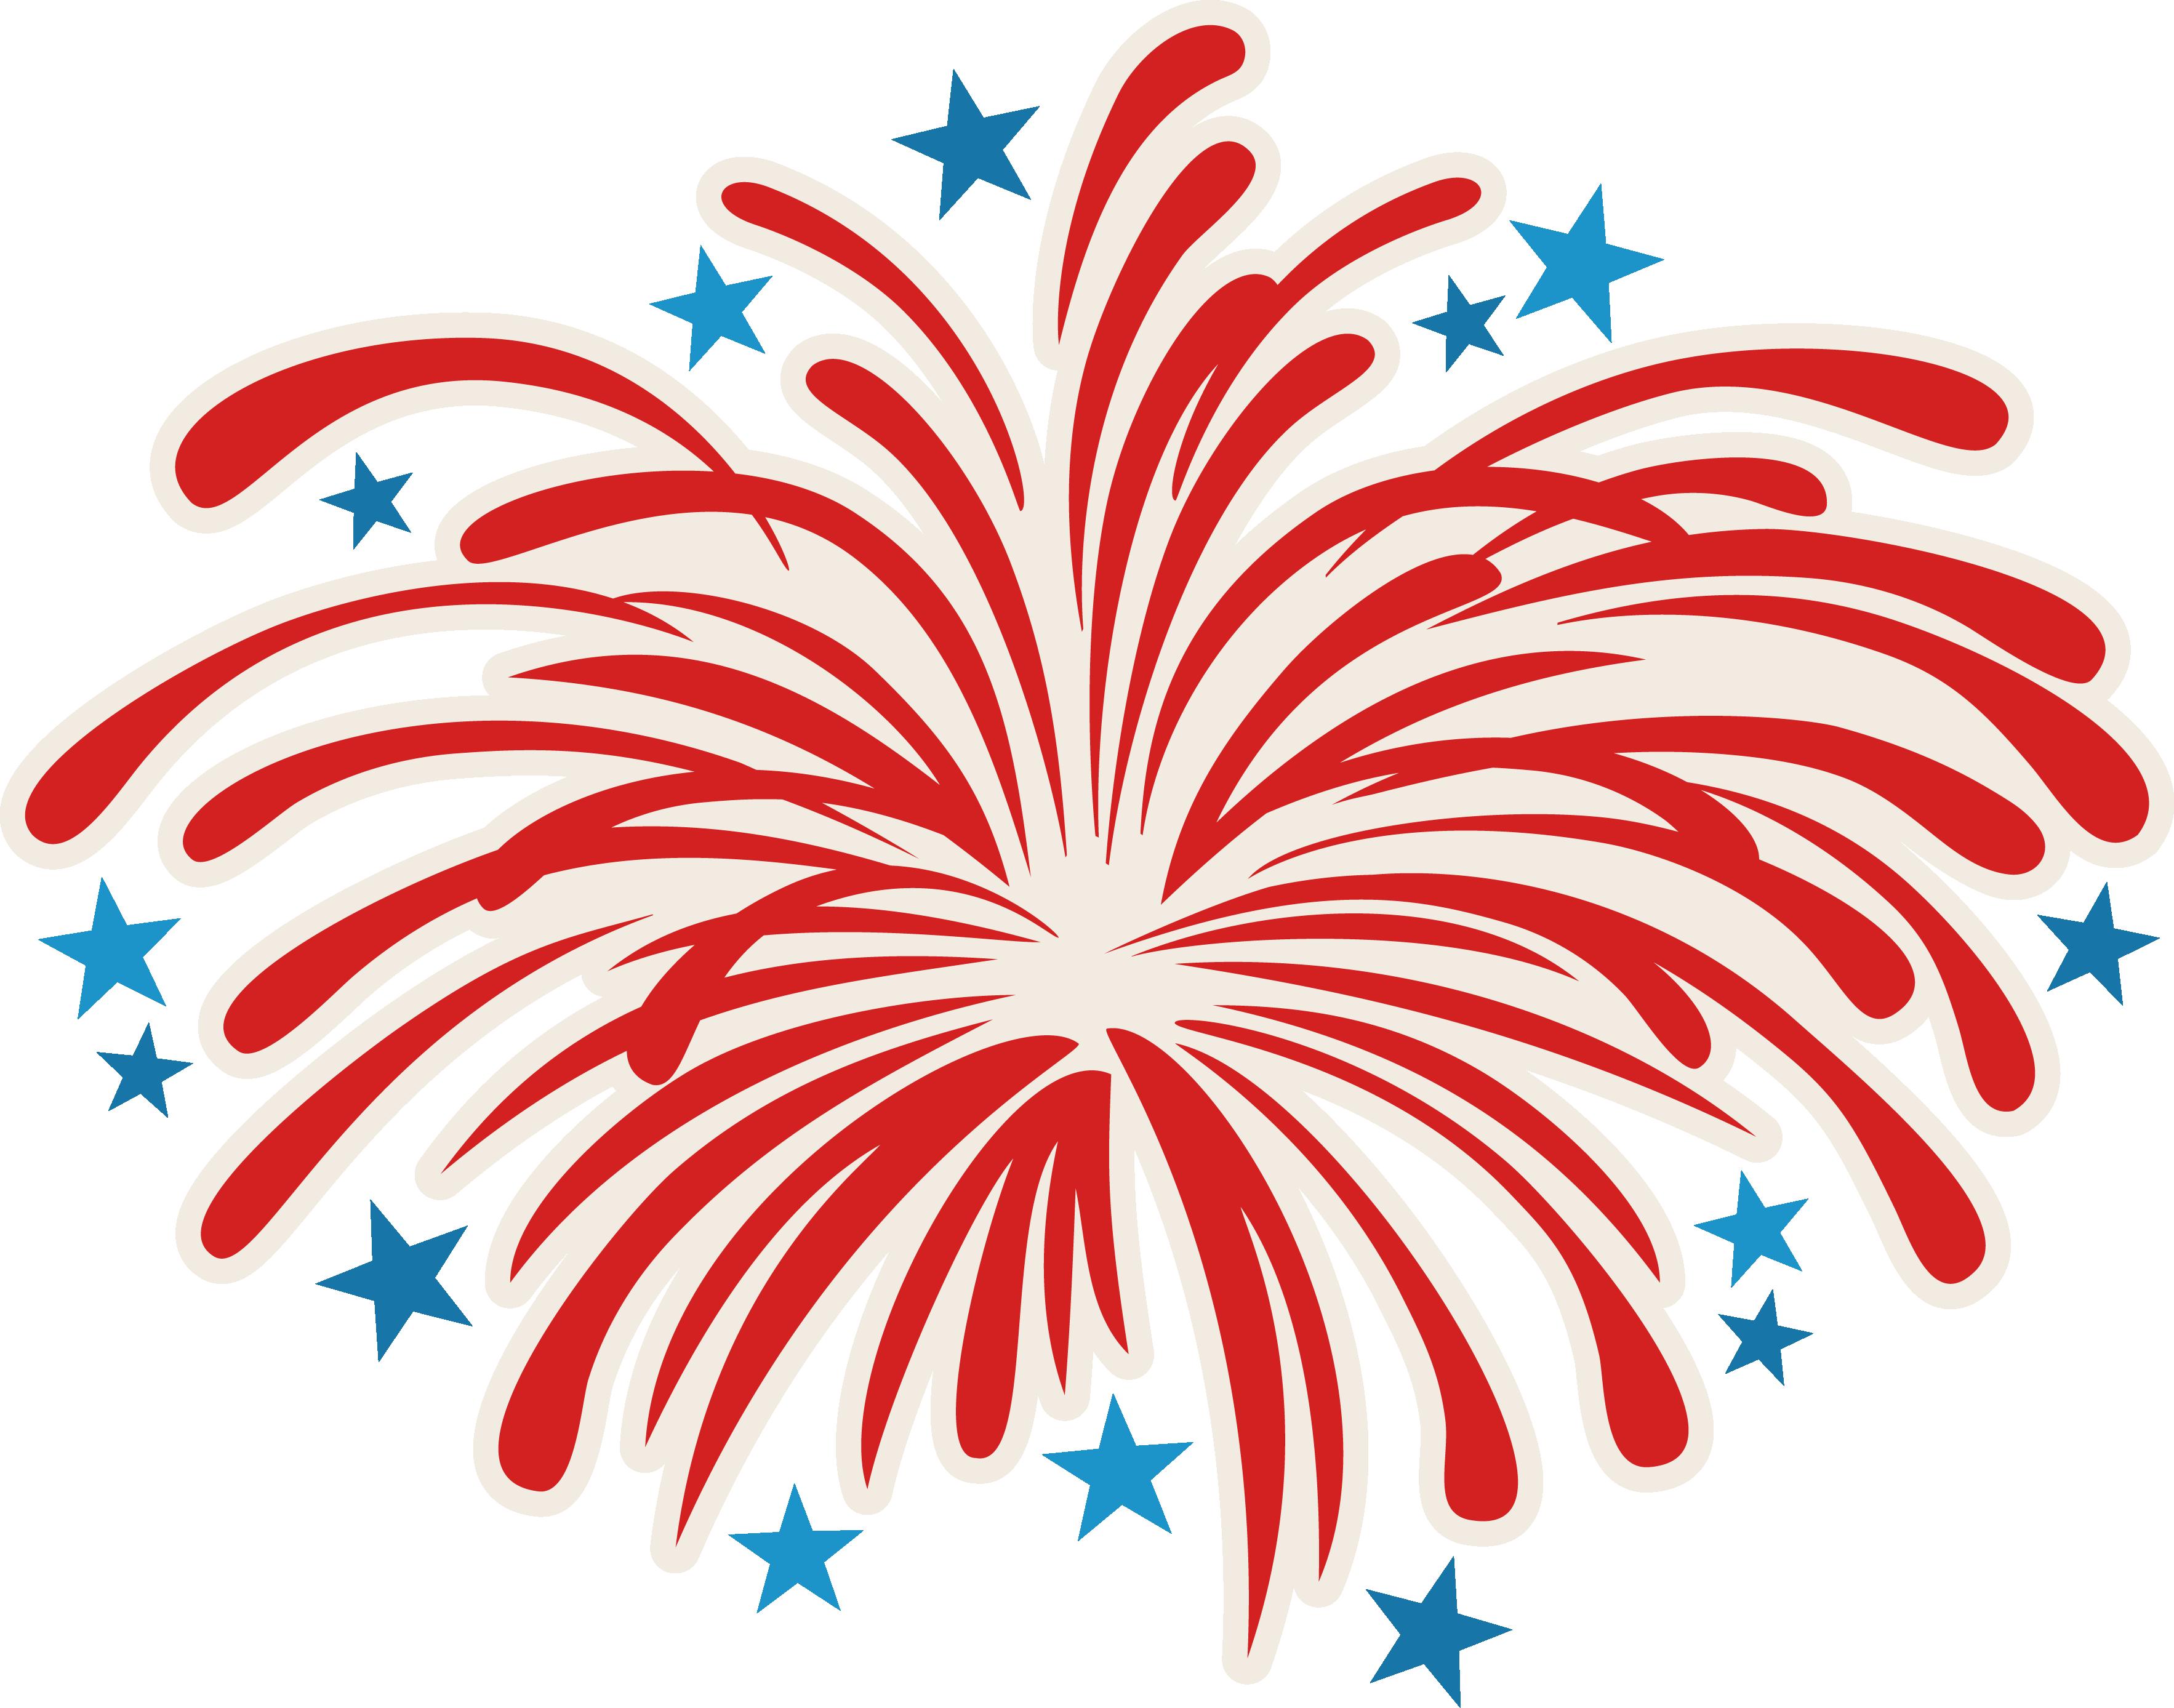 png royalty free download Firework blast svg s. Fireworks clipart.